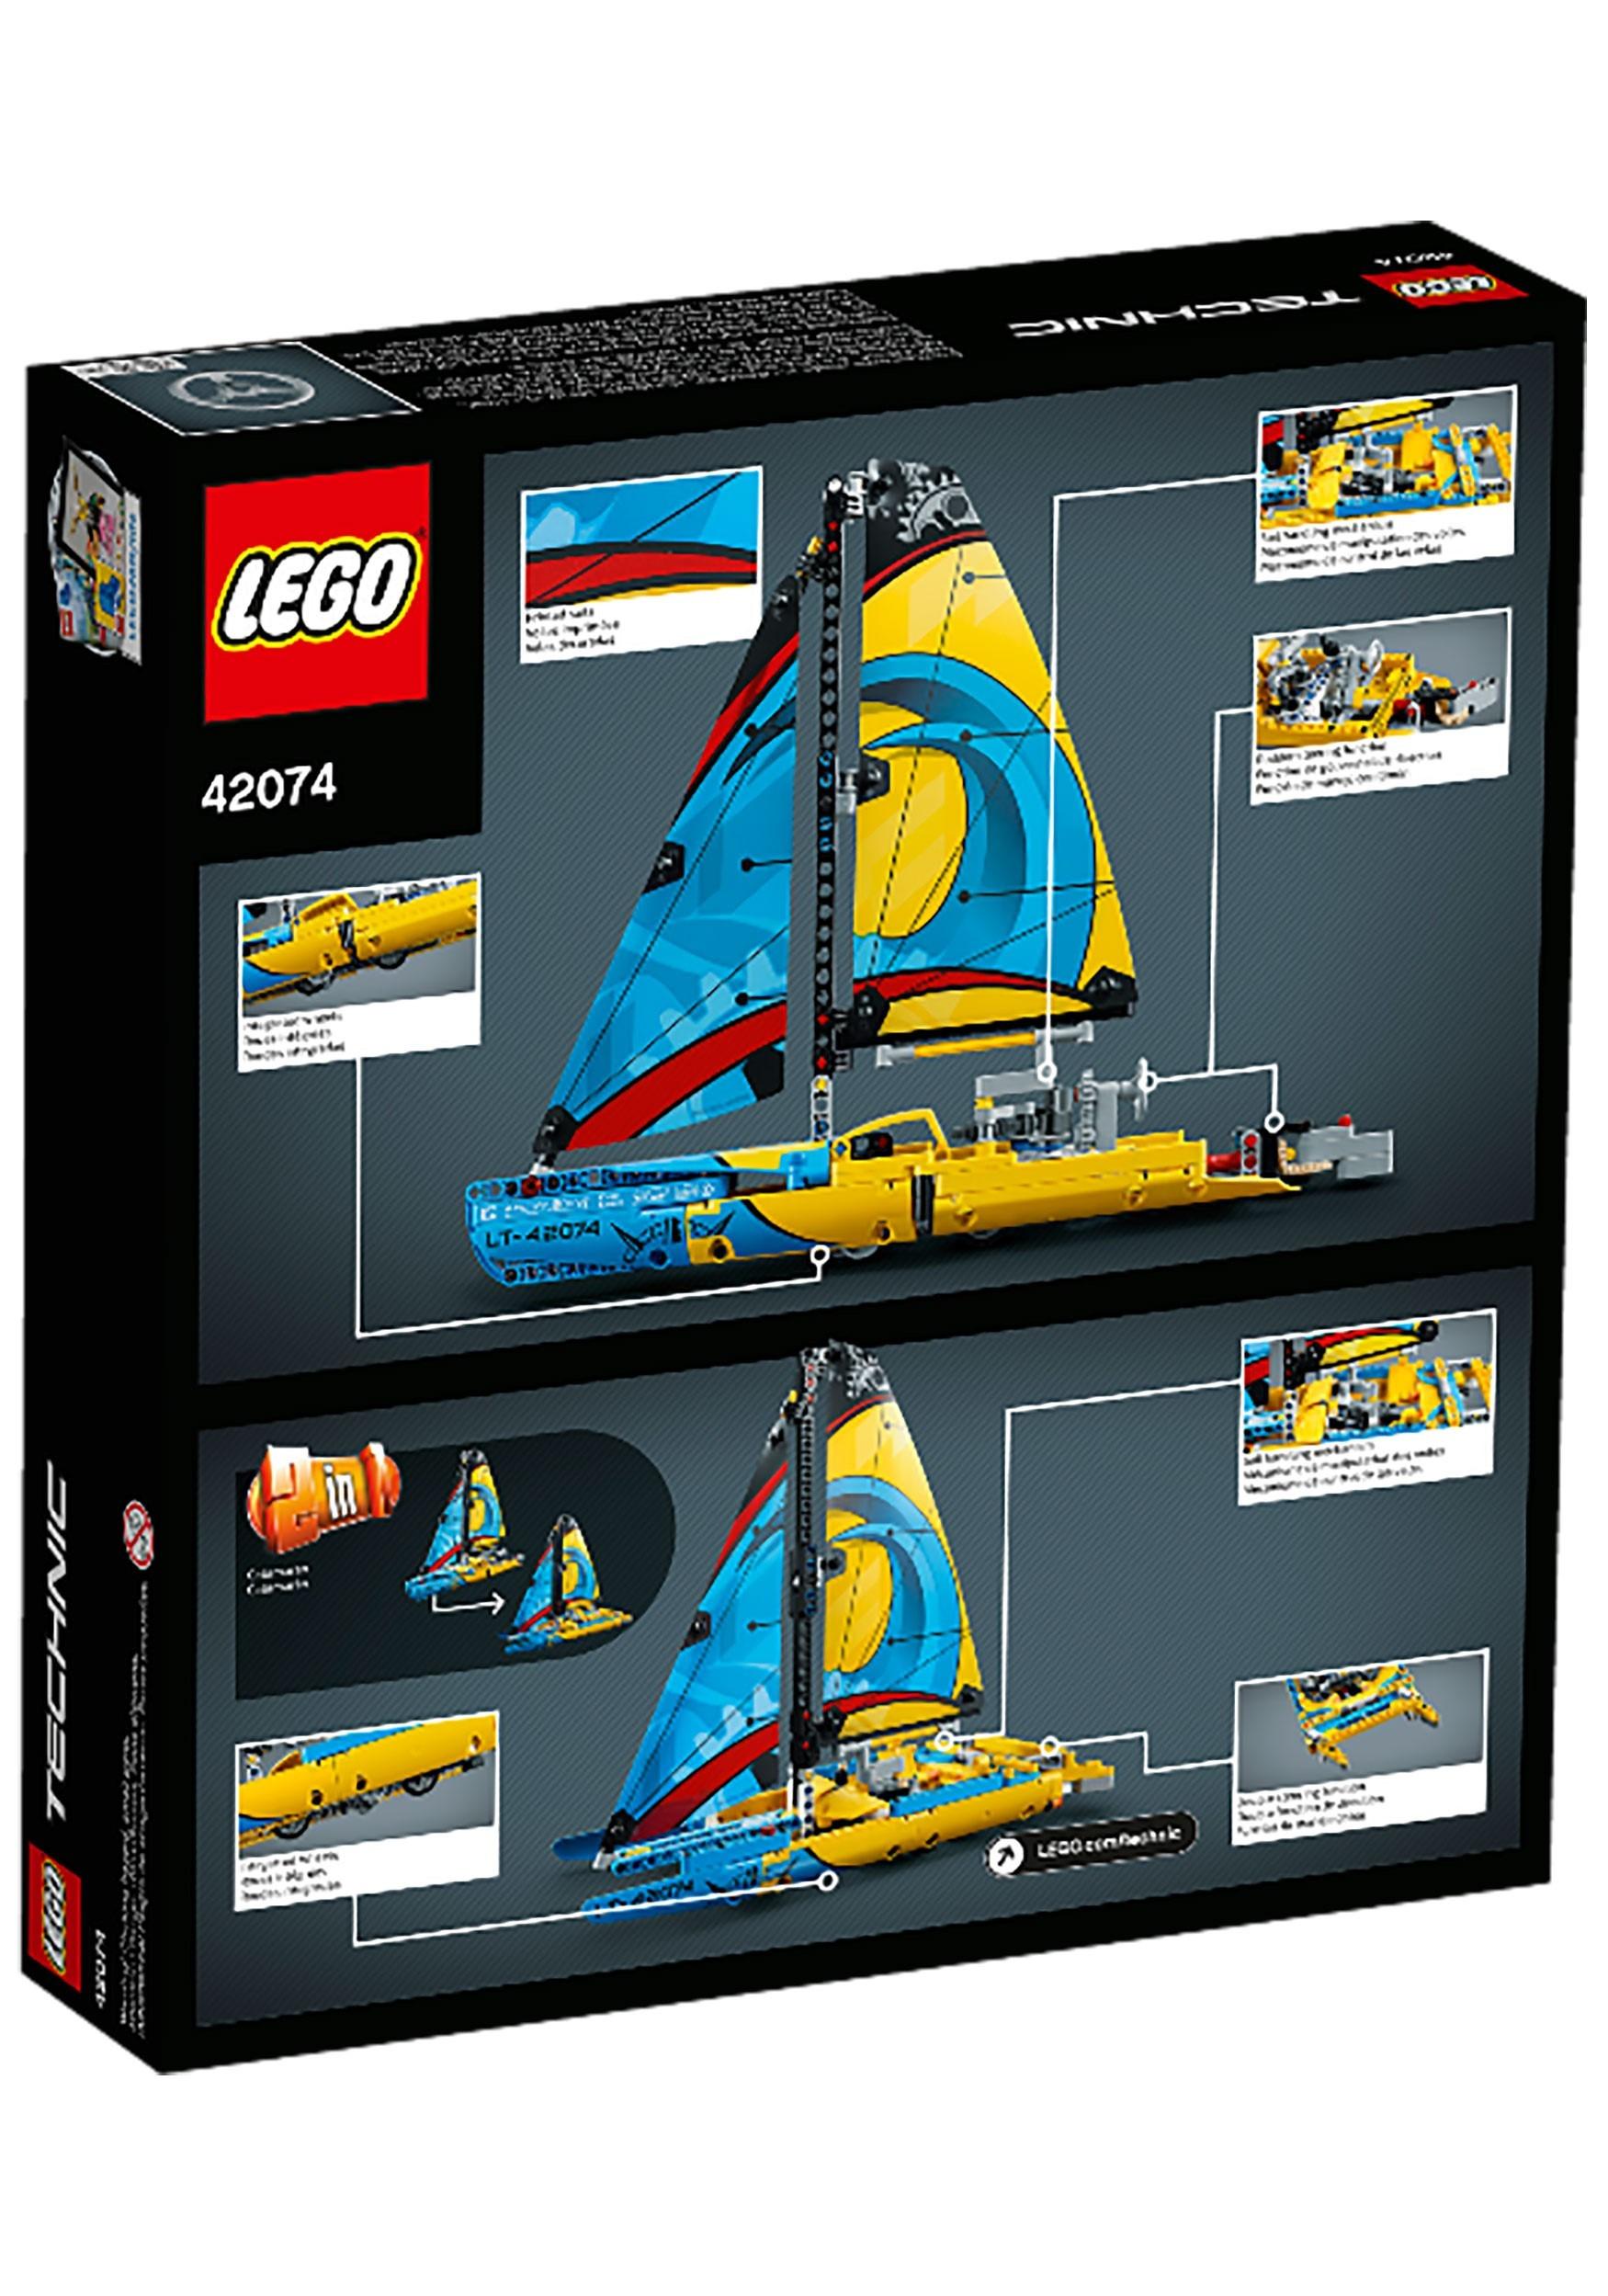 lego technic racing yacht set. Black Bedroom Furniture Sets. Home Design Ideas